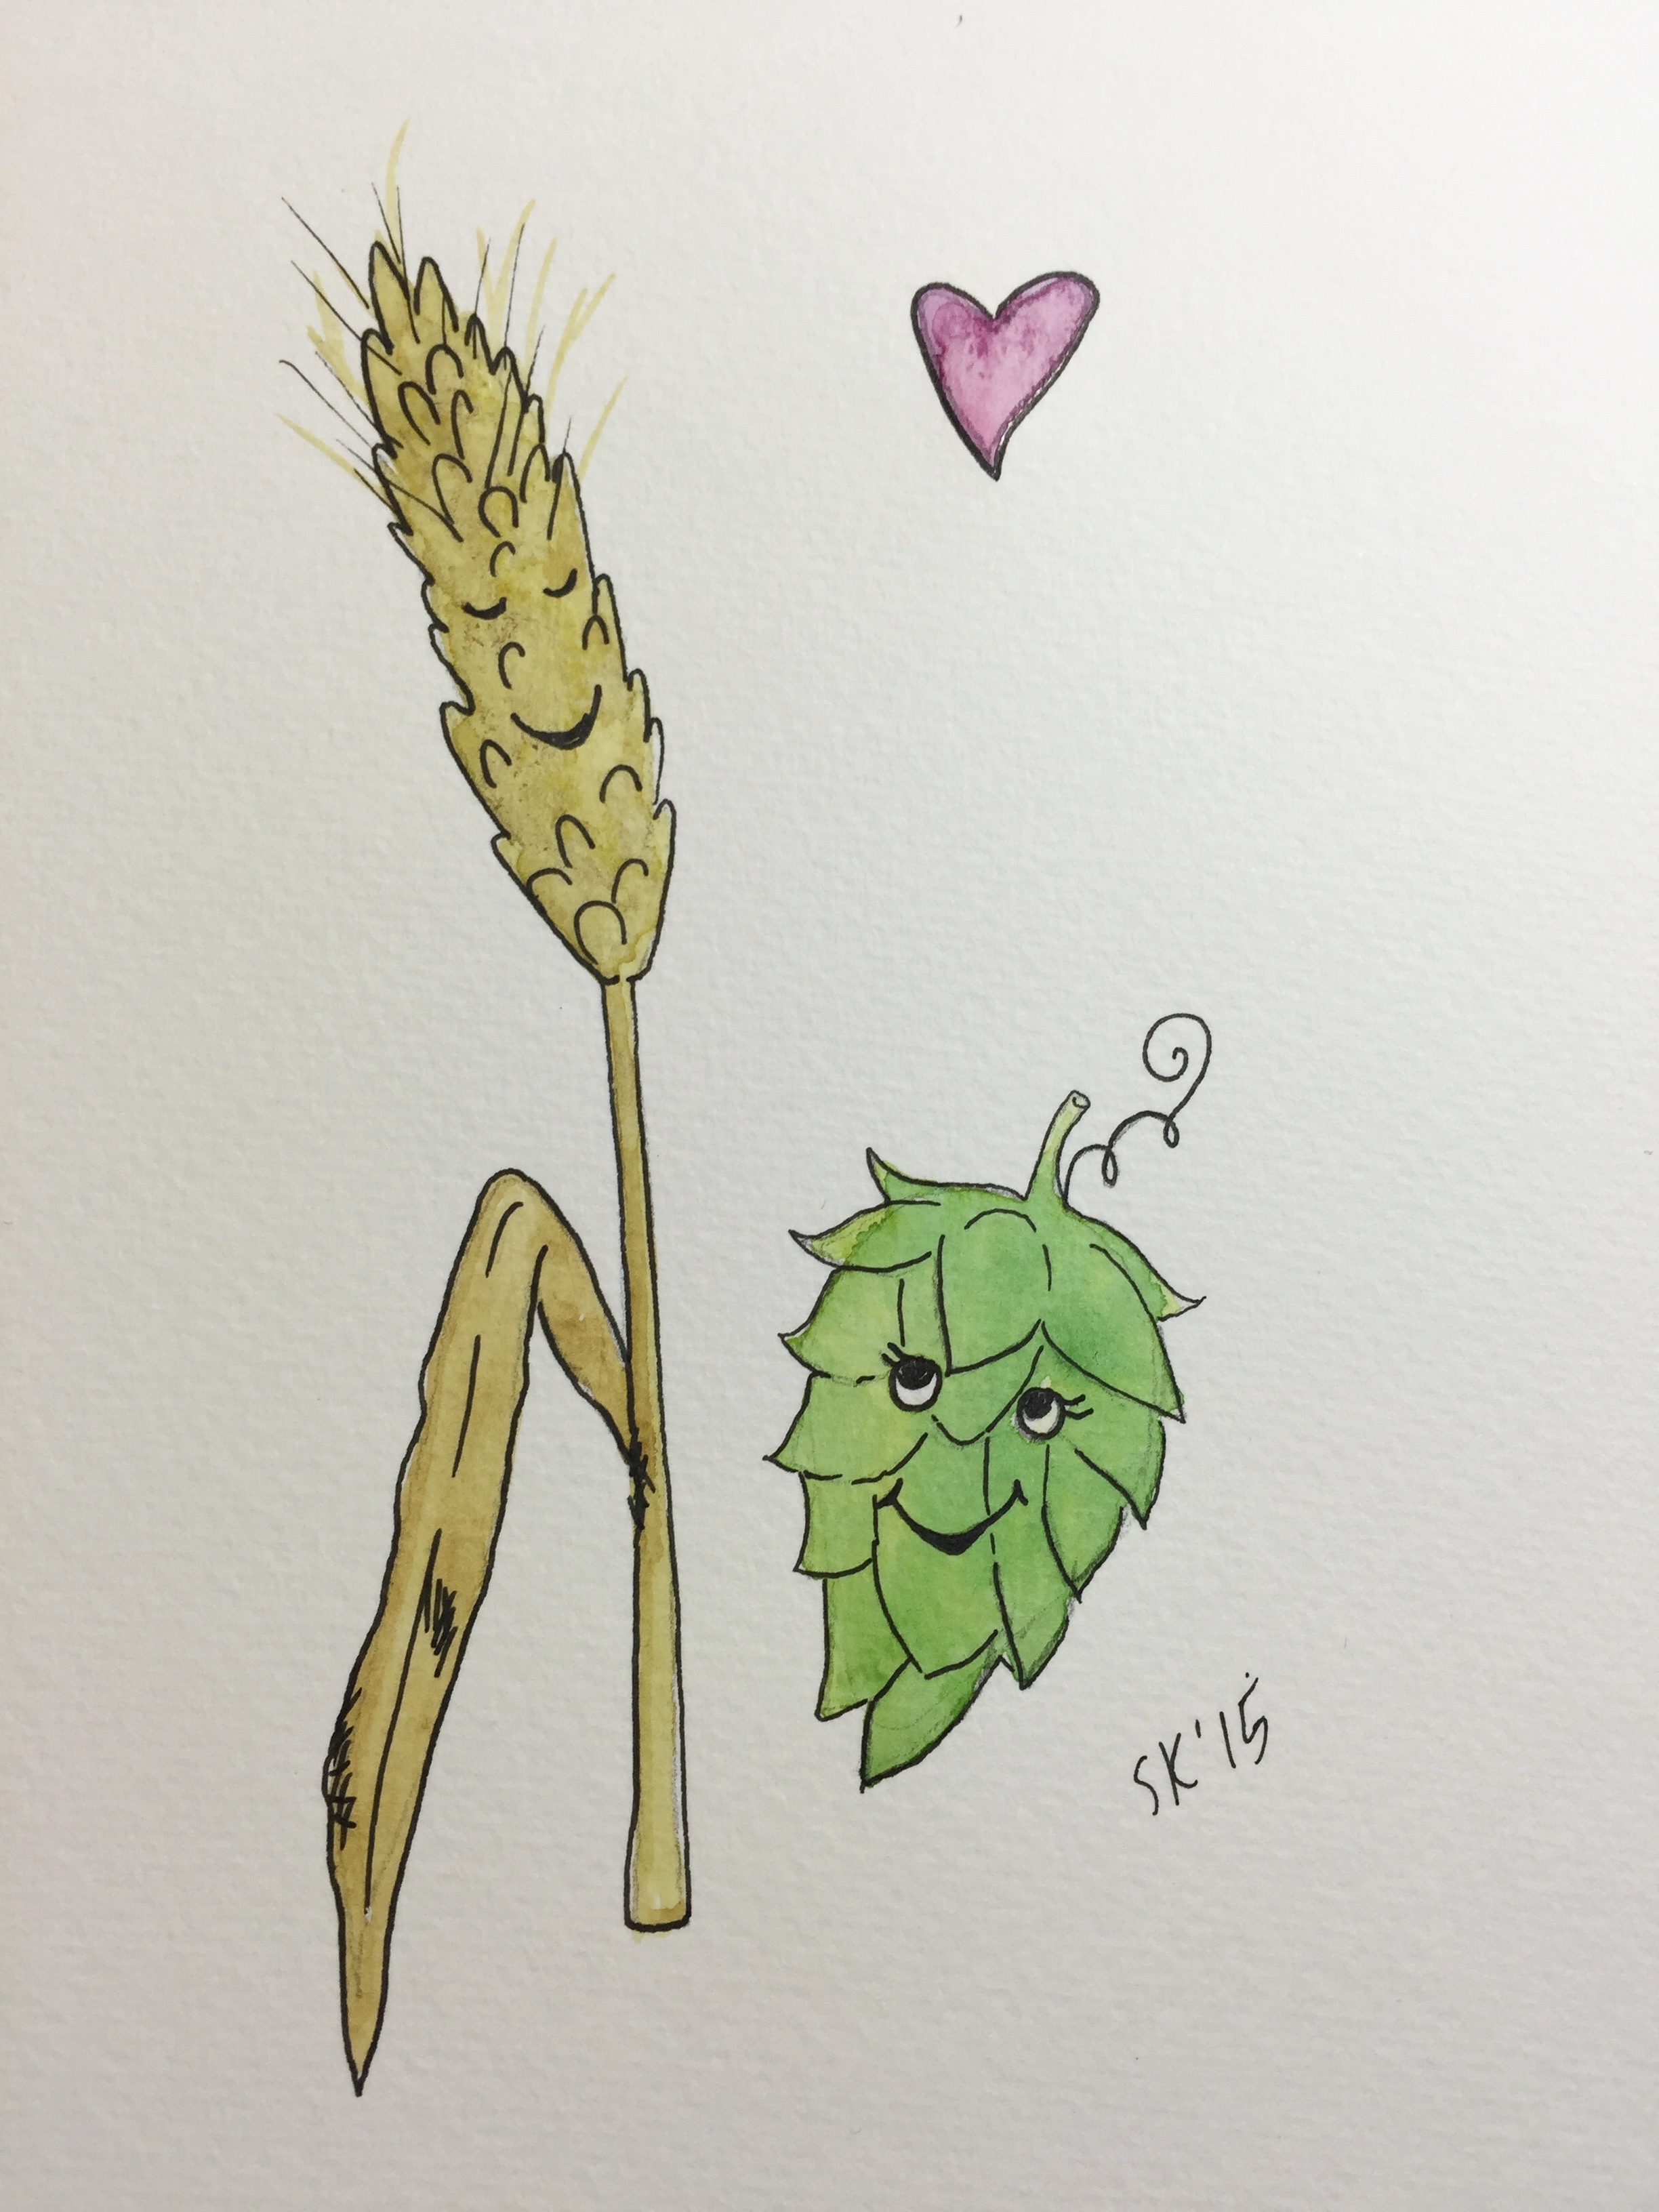 We Go Together Like Barley and Hops